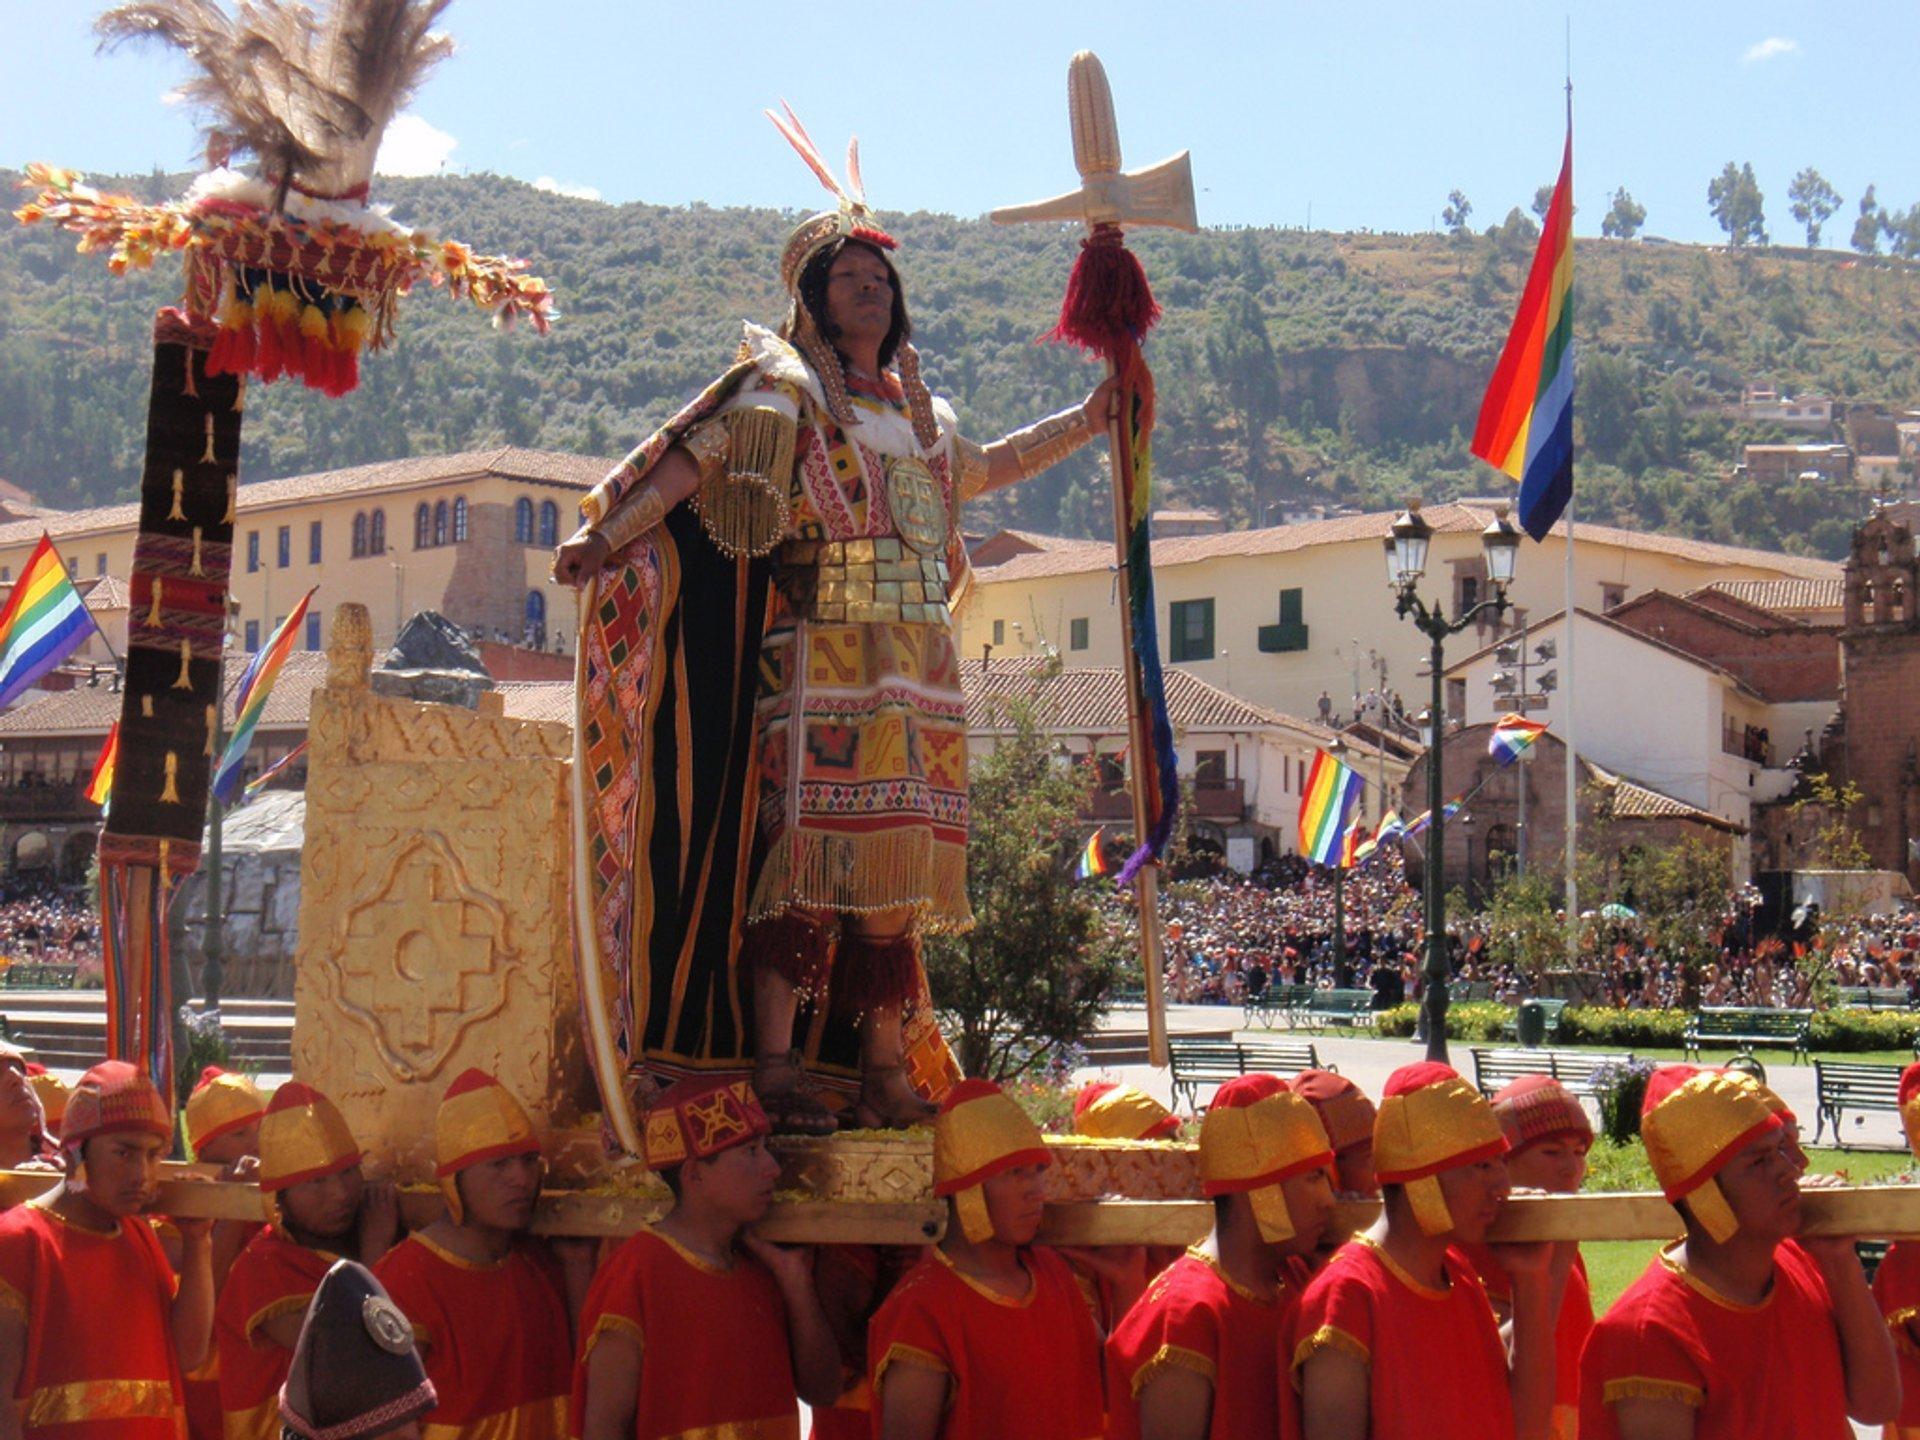 Inti Raymi in Machu Picchu and Cusco - Best Season 2020